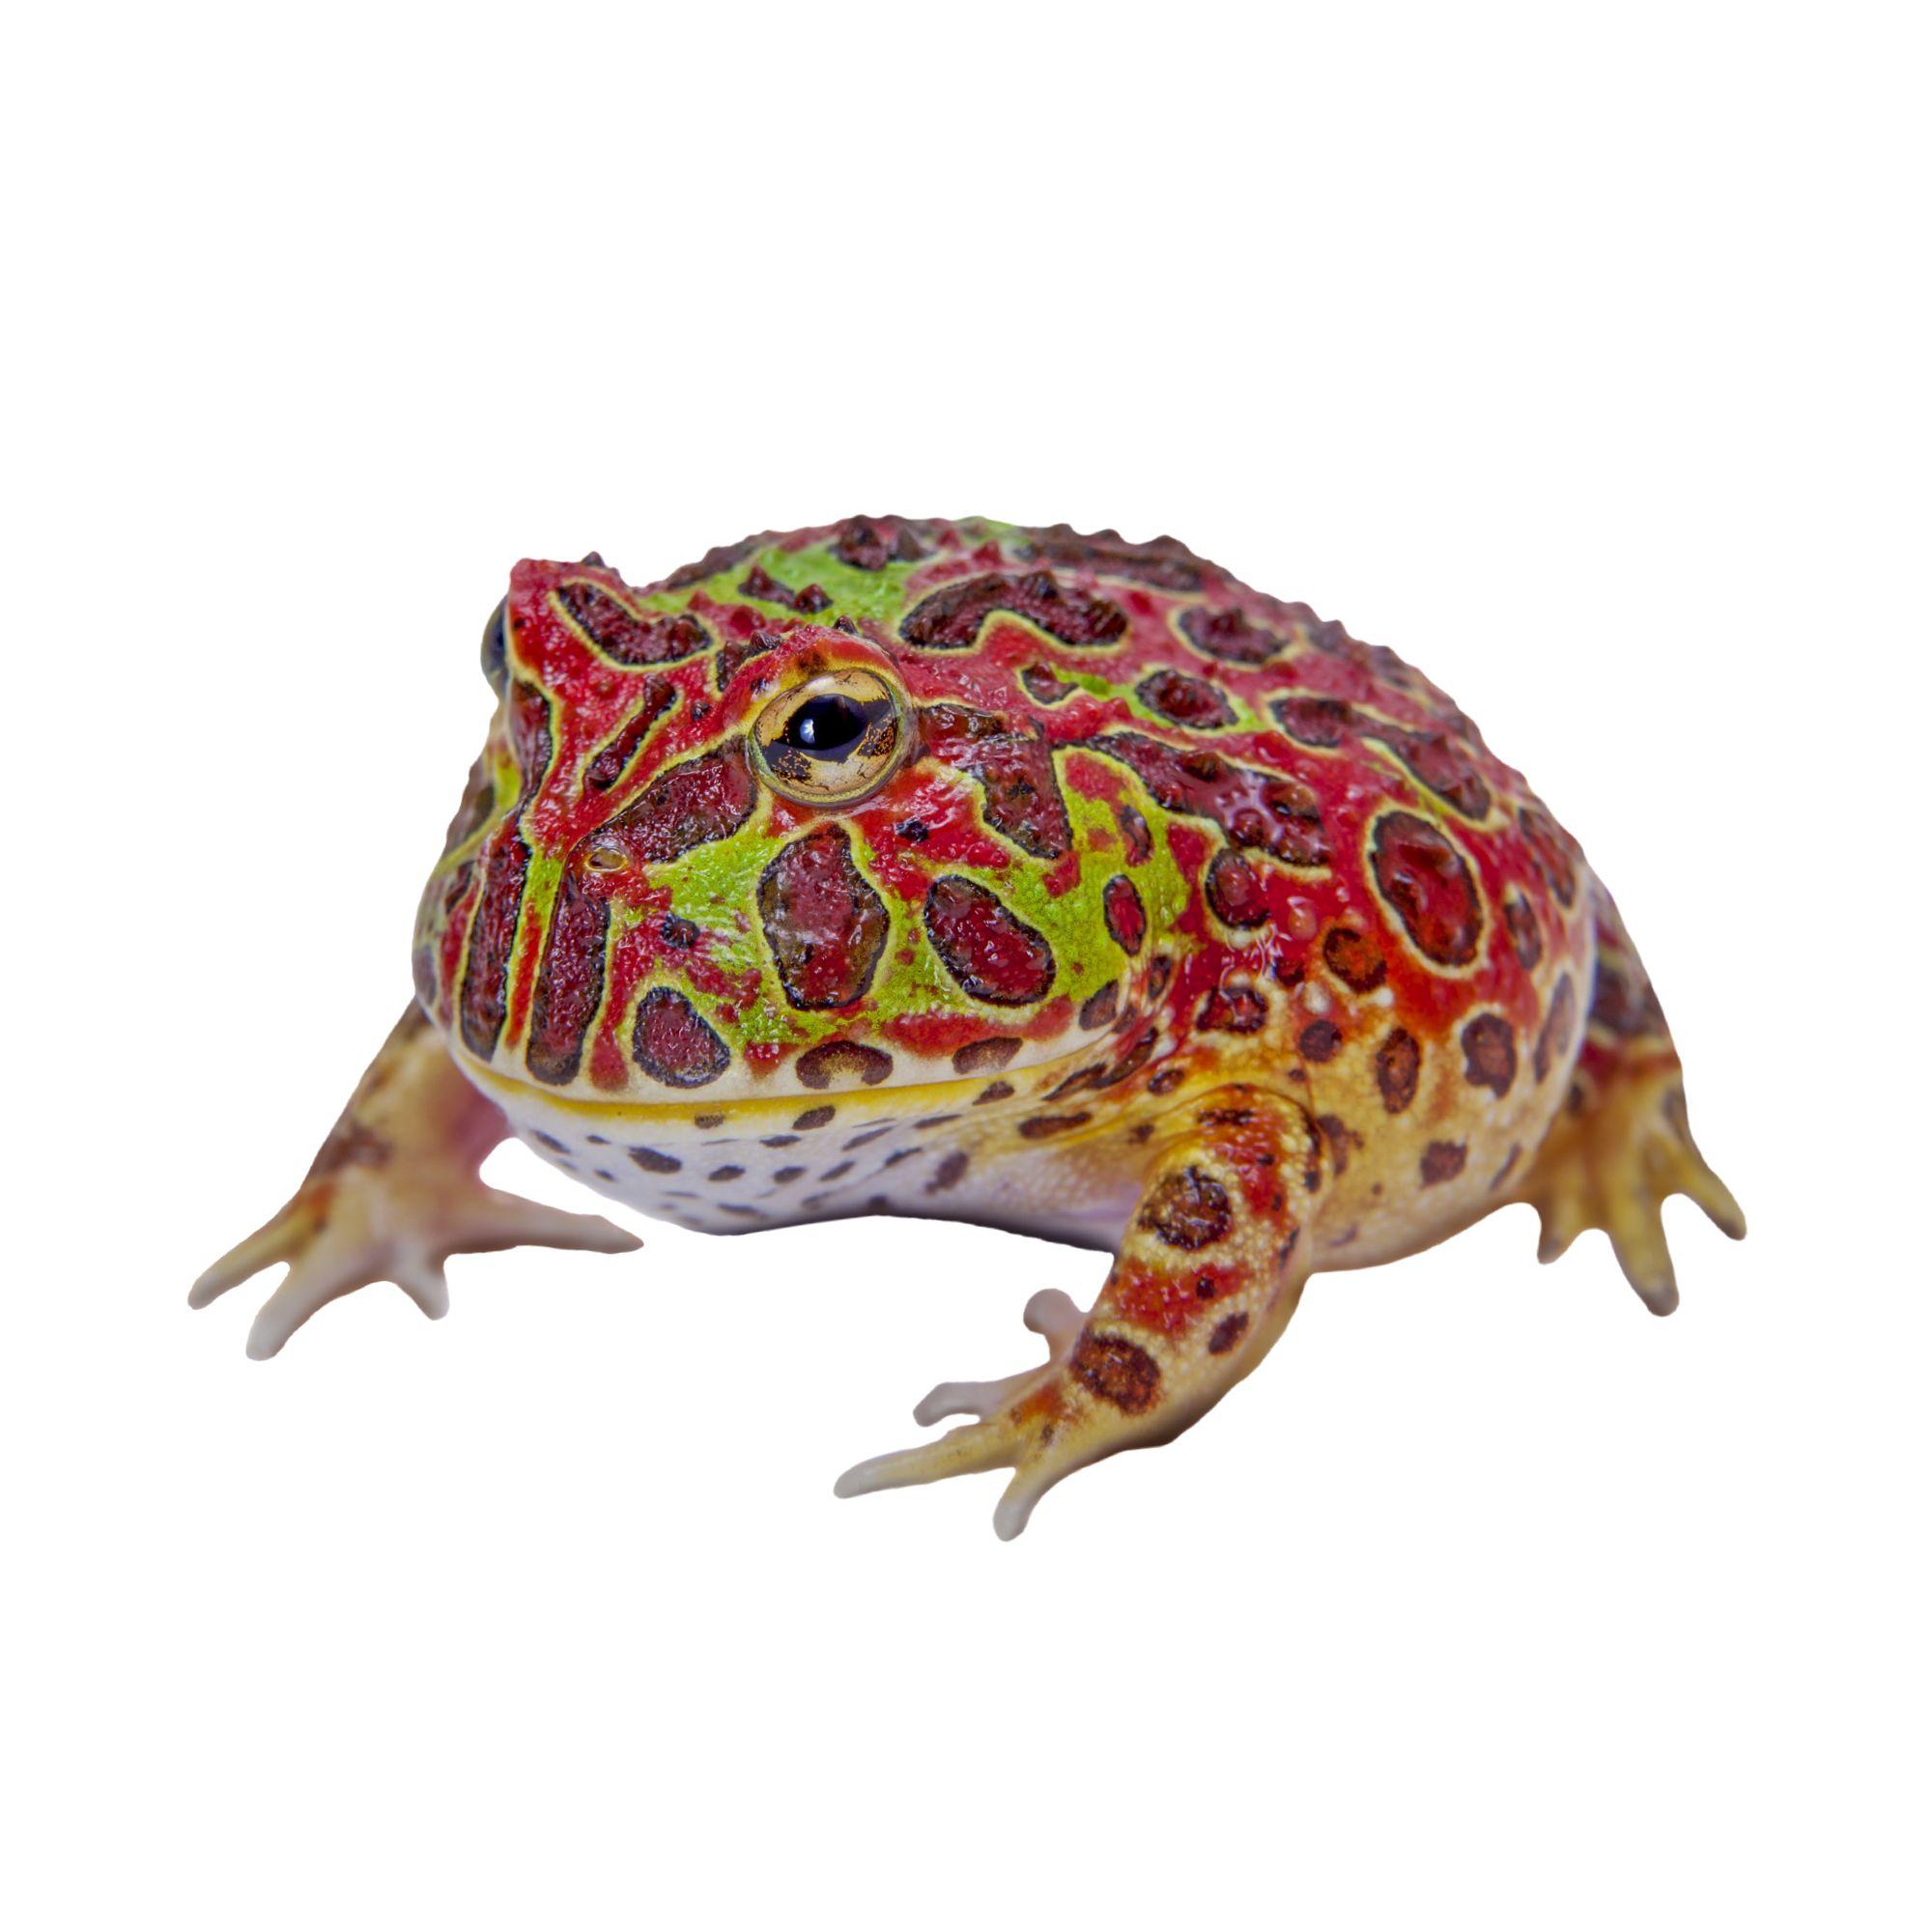 Pacman Frog Reptile Snakes Turtles More Petsmart